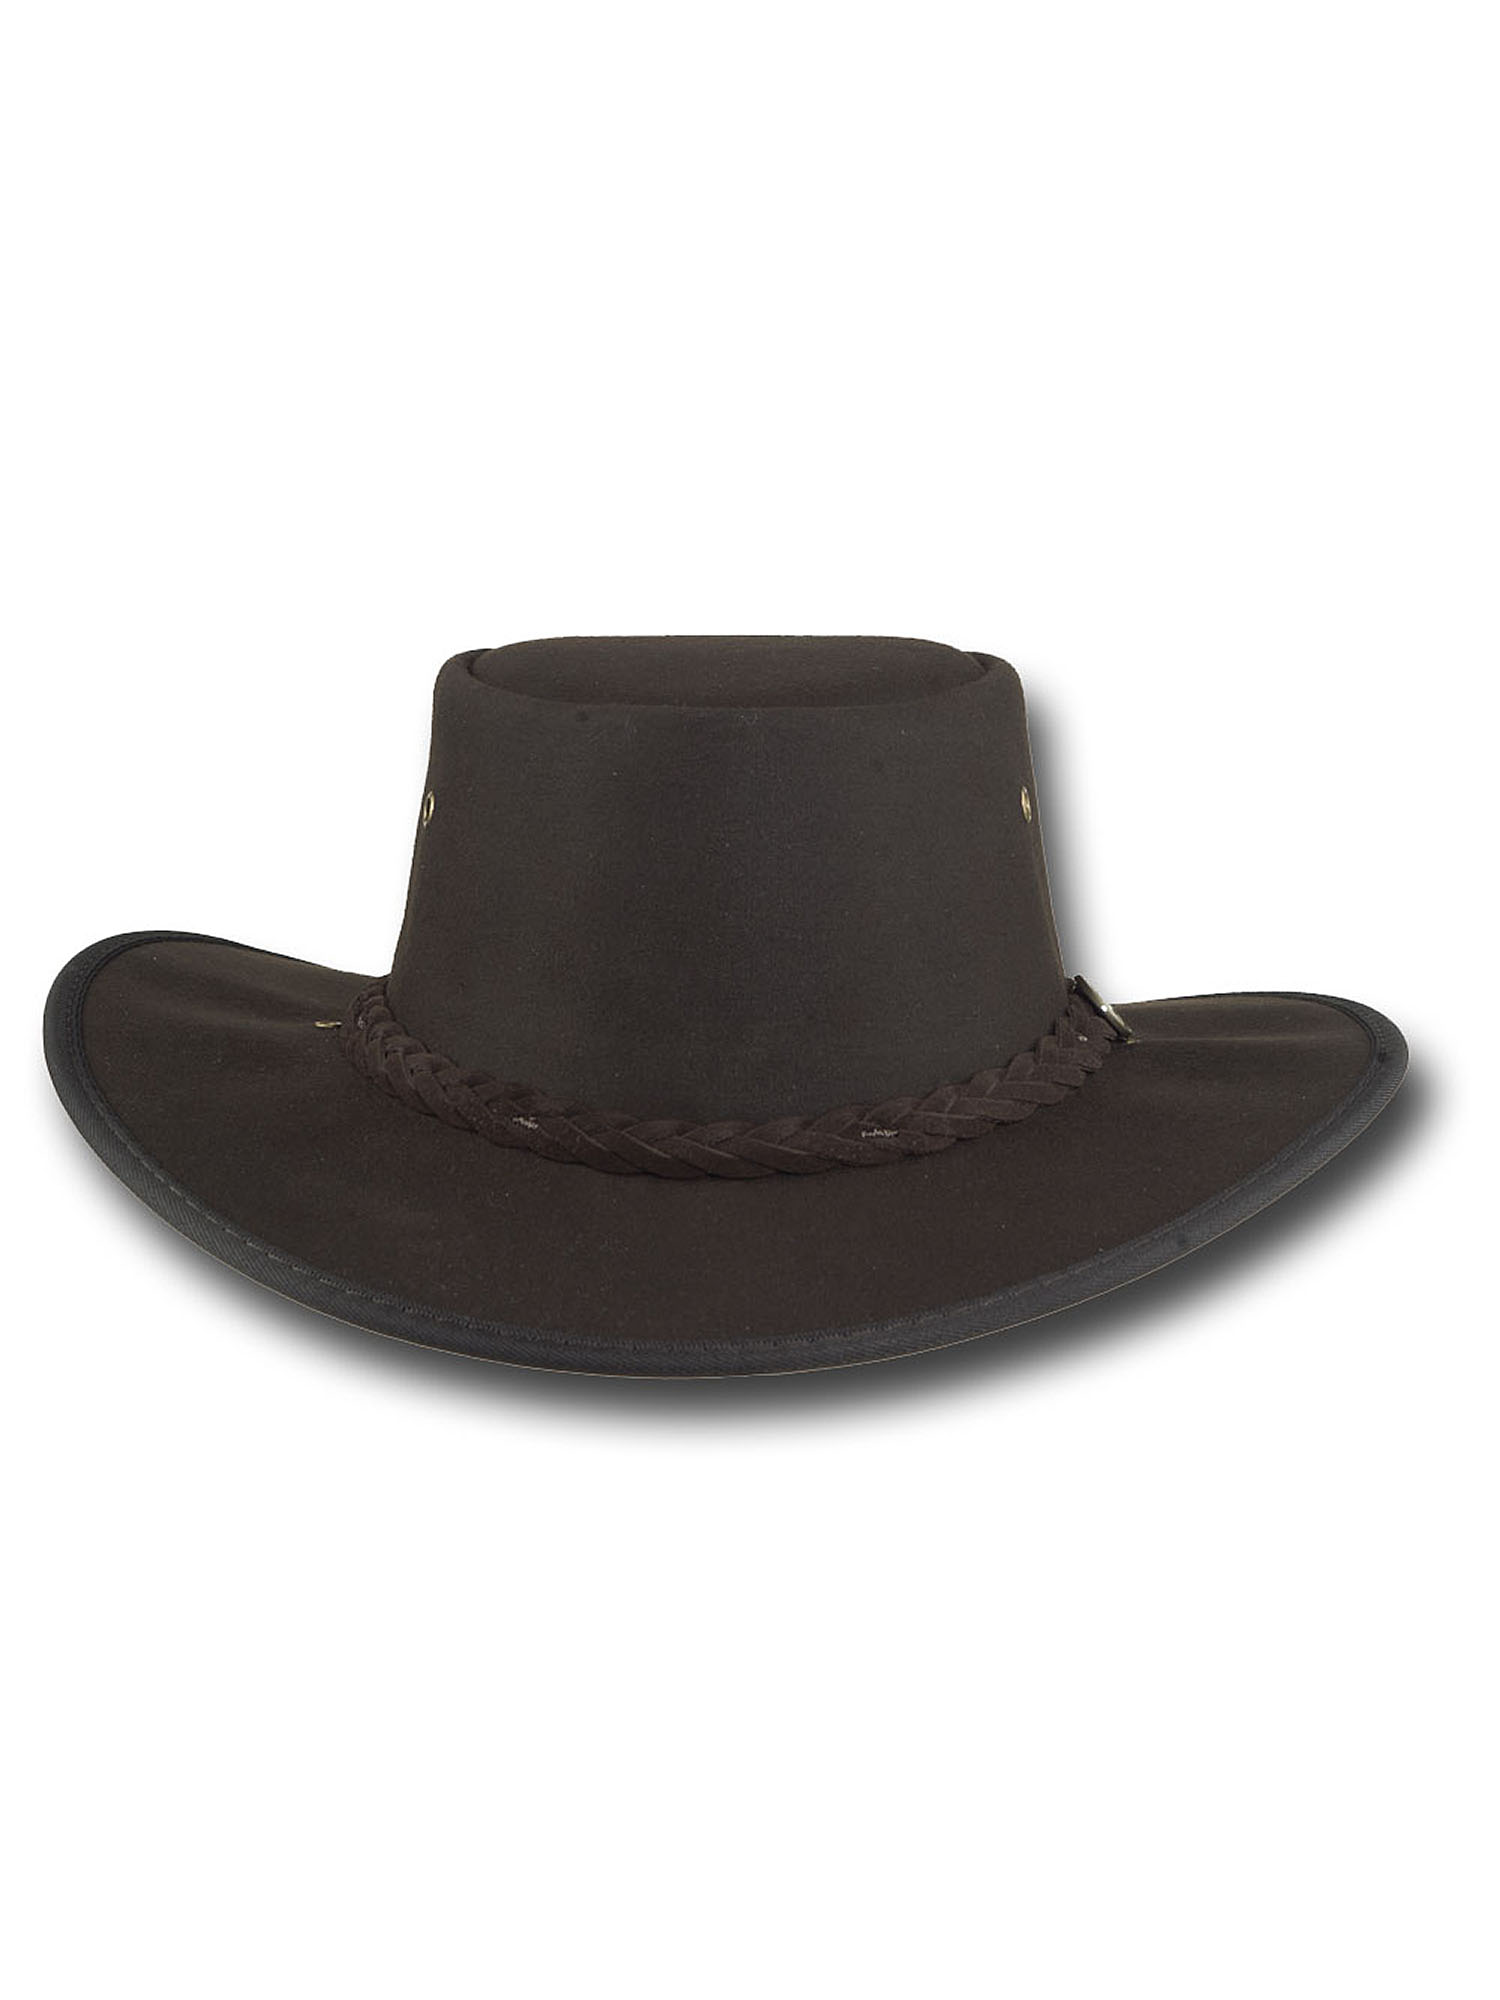 d3421214ddd3d Barmah Hats Drover Oil Skin Hat - Item 1050 - Walmart.com